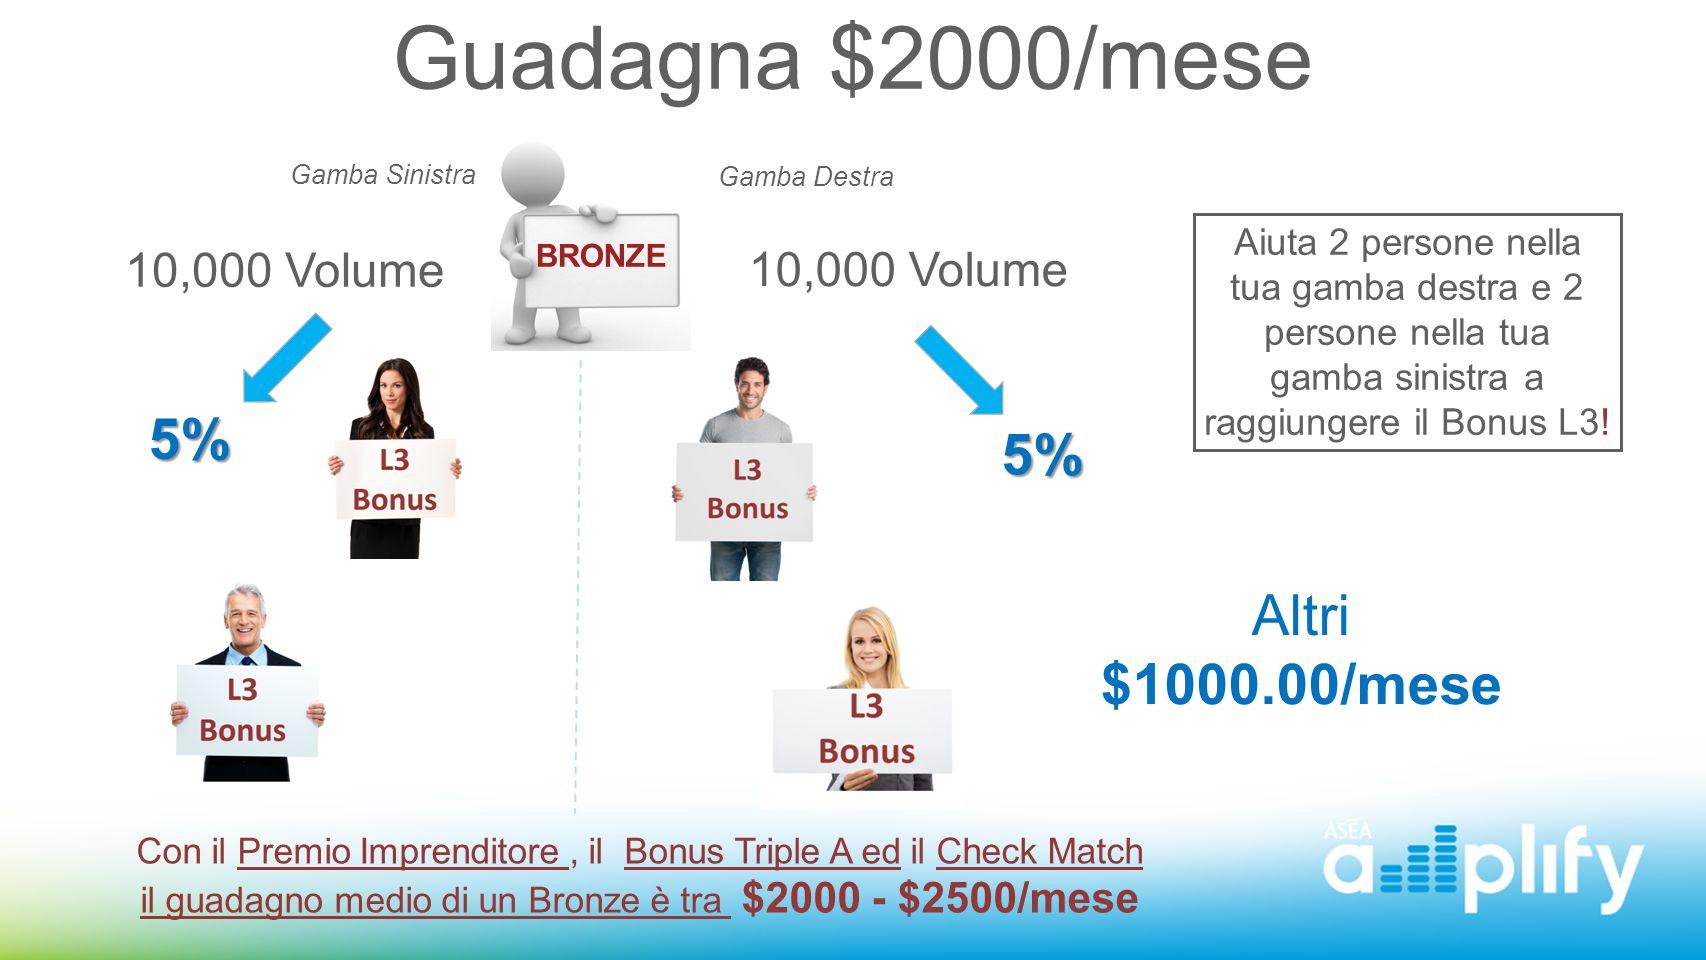 Guadagna $2000/mese 5% 5% Altri $1000.00/mese 10,000 Volume